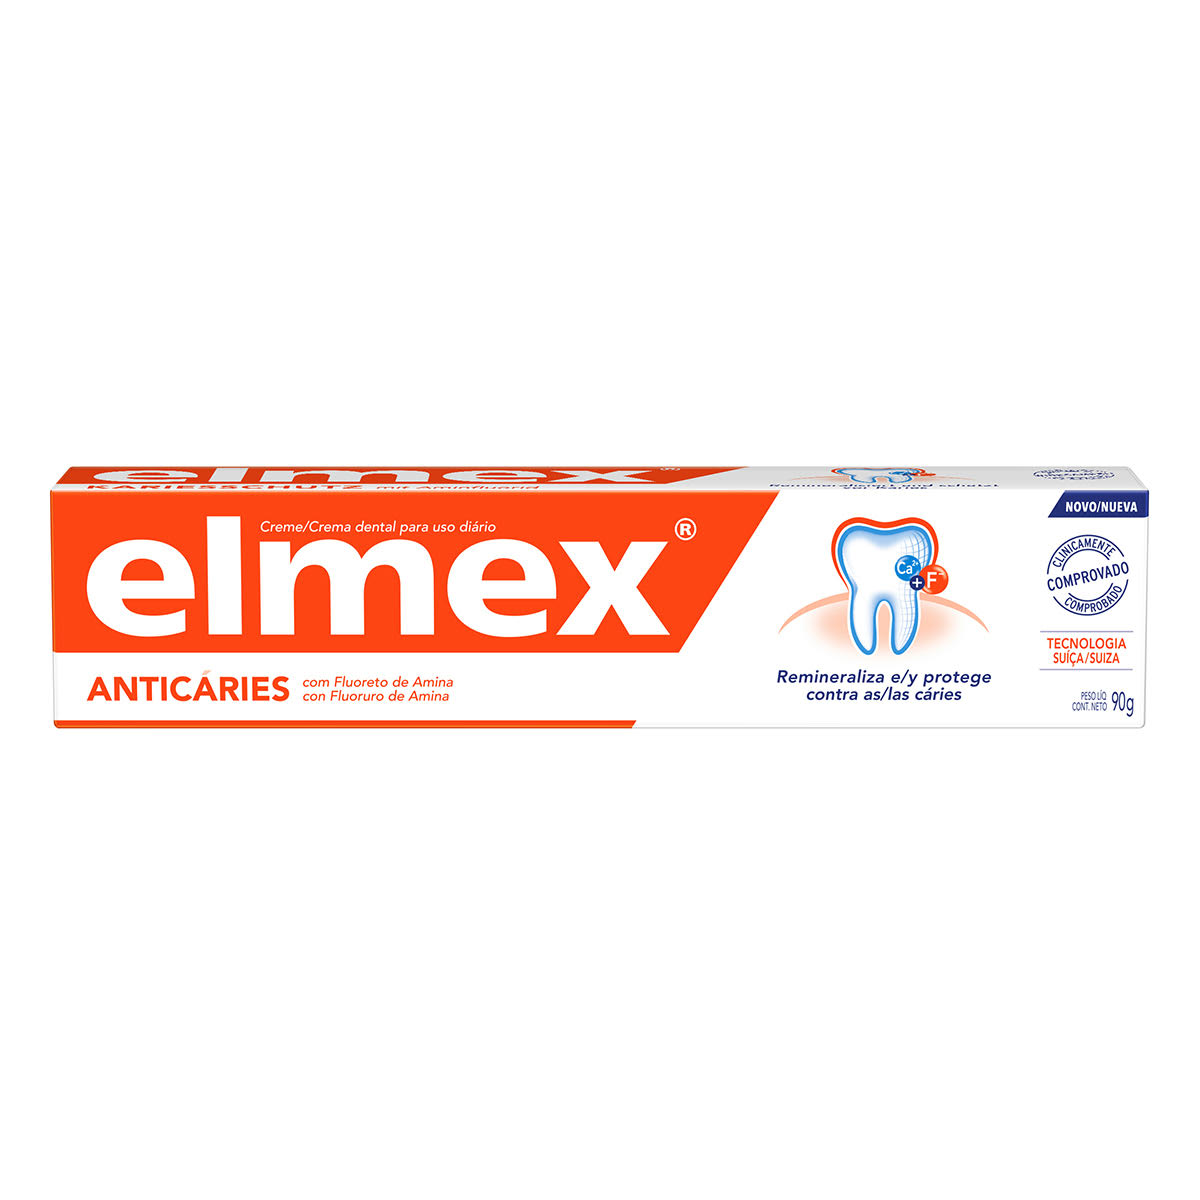 Pasta dental elmex® Anticaries, remineraliza y protege contra la caries.